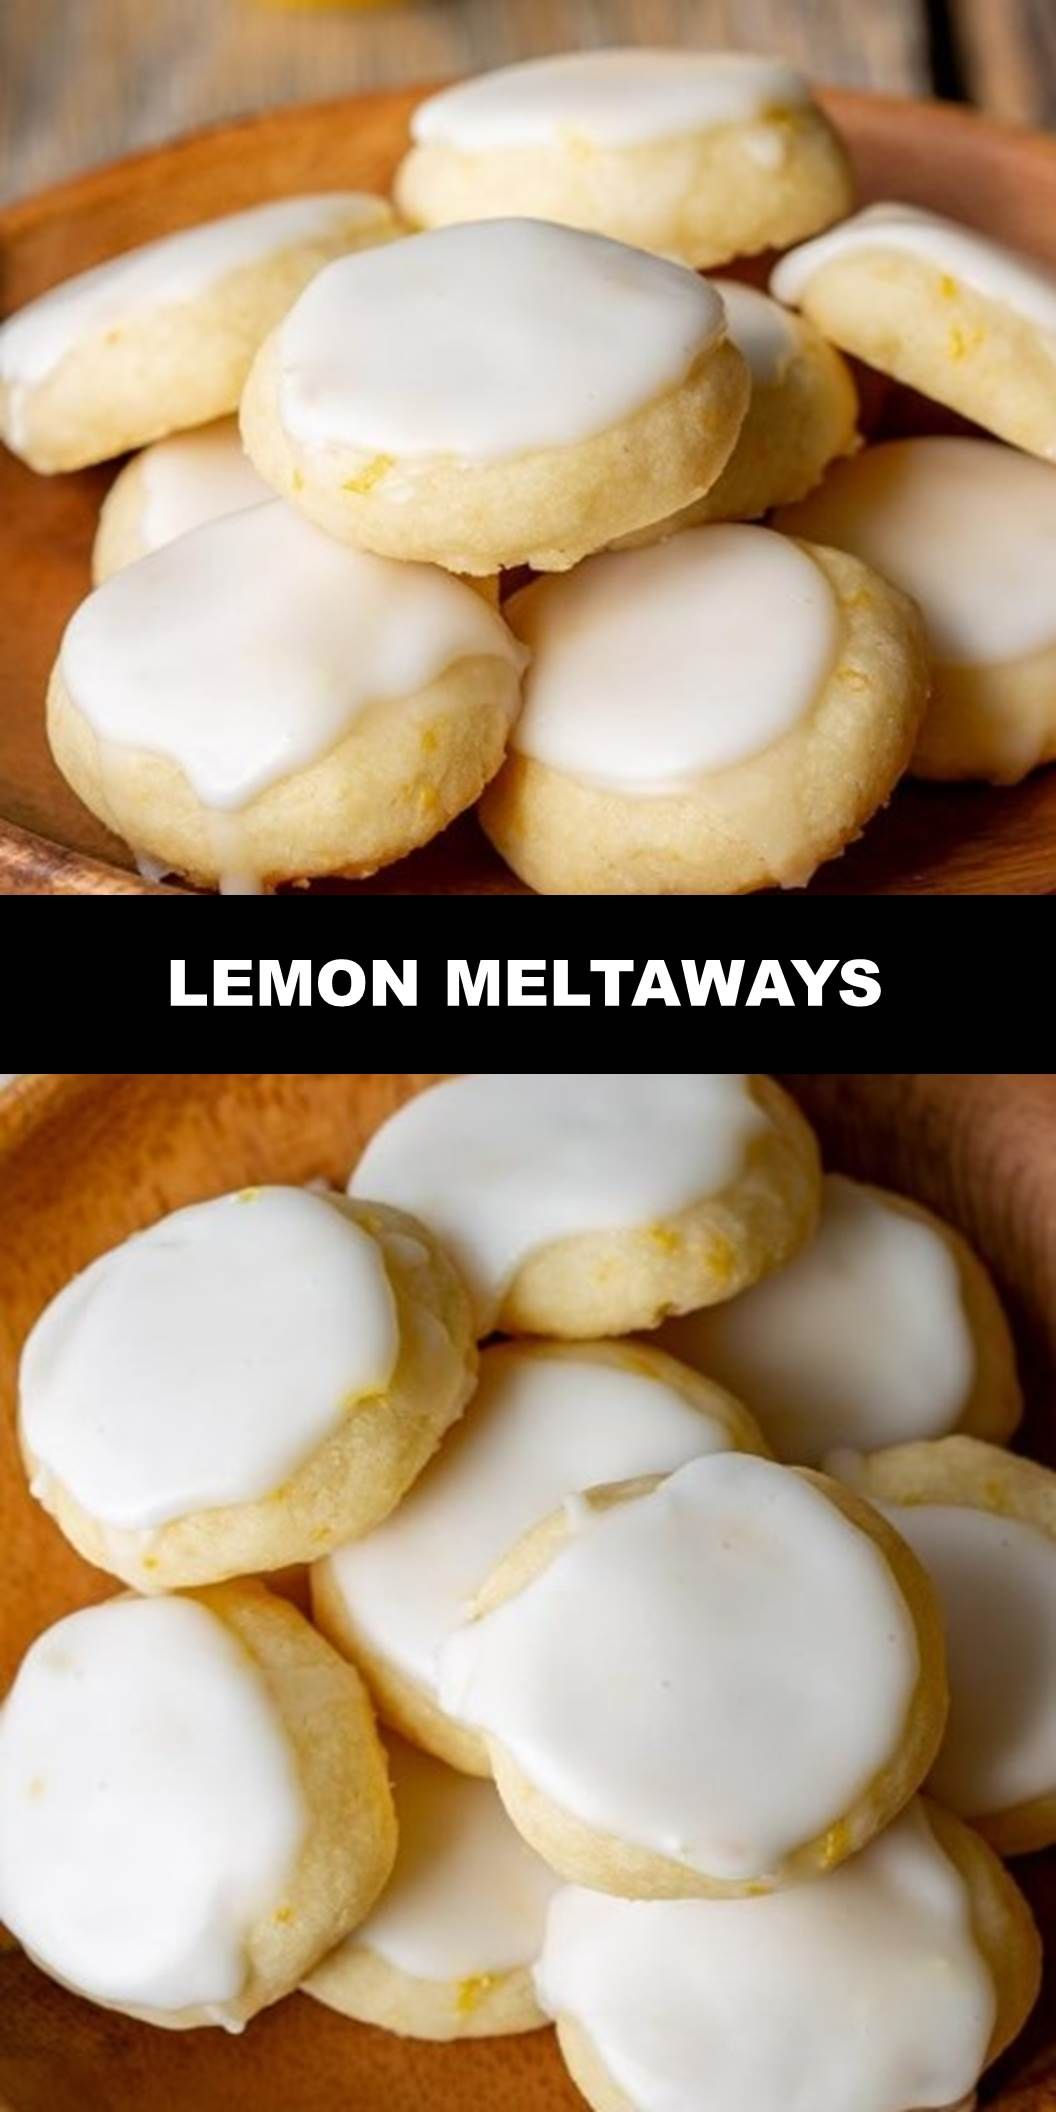 The World's Most Delicious Lemon Meltaways Prep Time 20 mins Cook Time 13 mins Total Time 33 mins